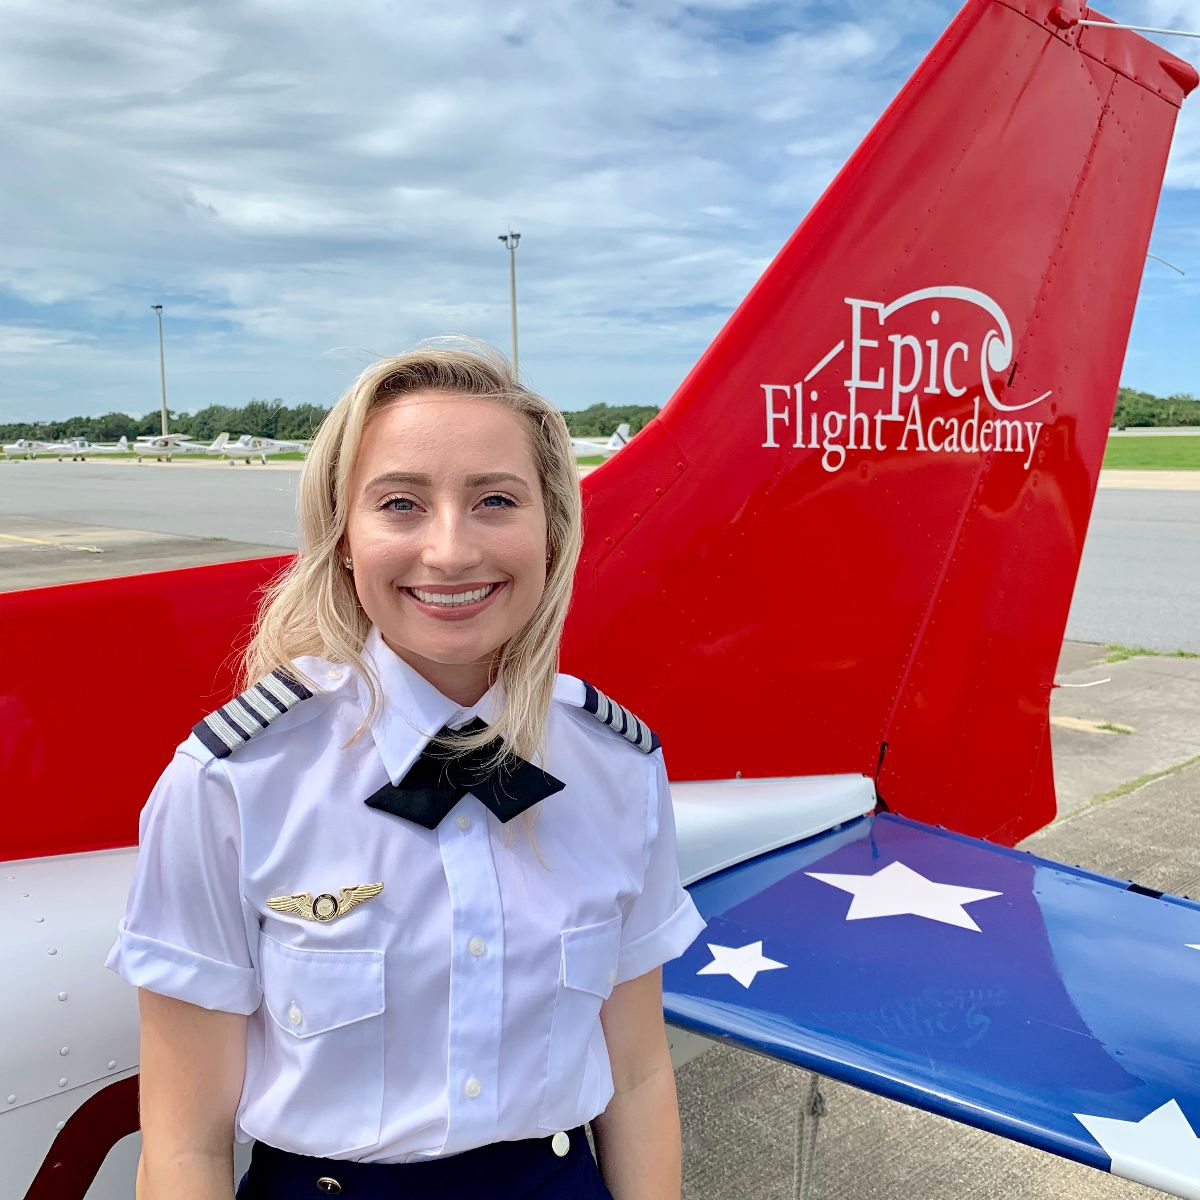 CFI Emma Grimes at Epic Flight Academy